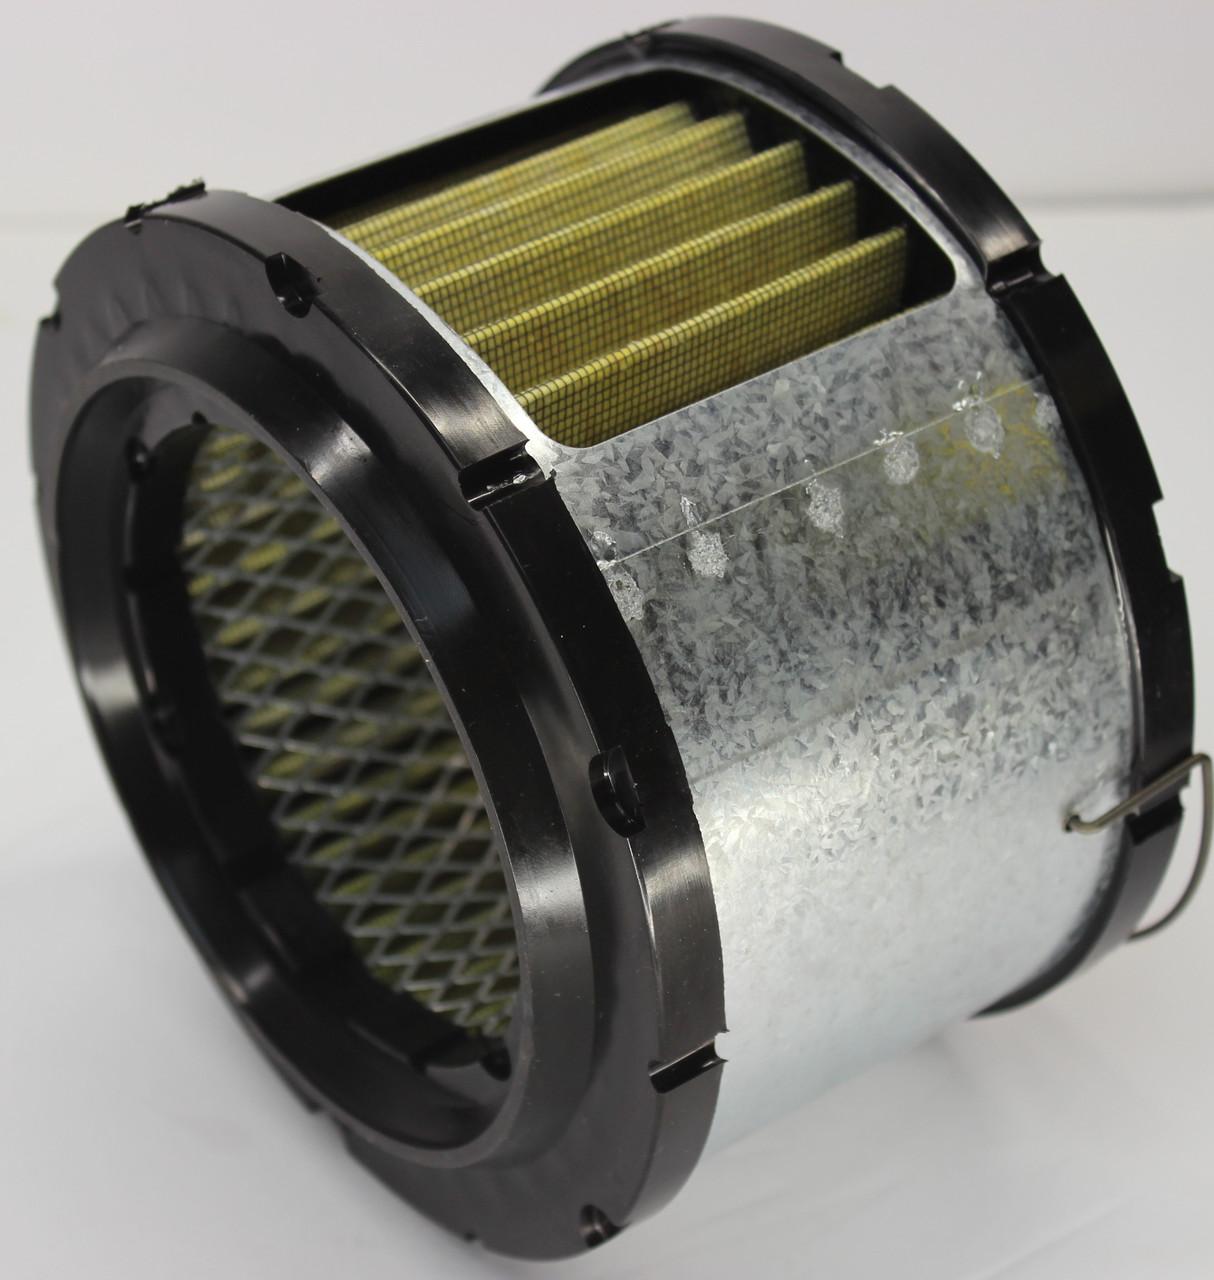 Cummins 3971076 Coalescing Filter Replacement (MPW-49380C)